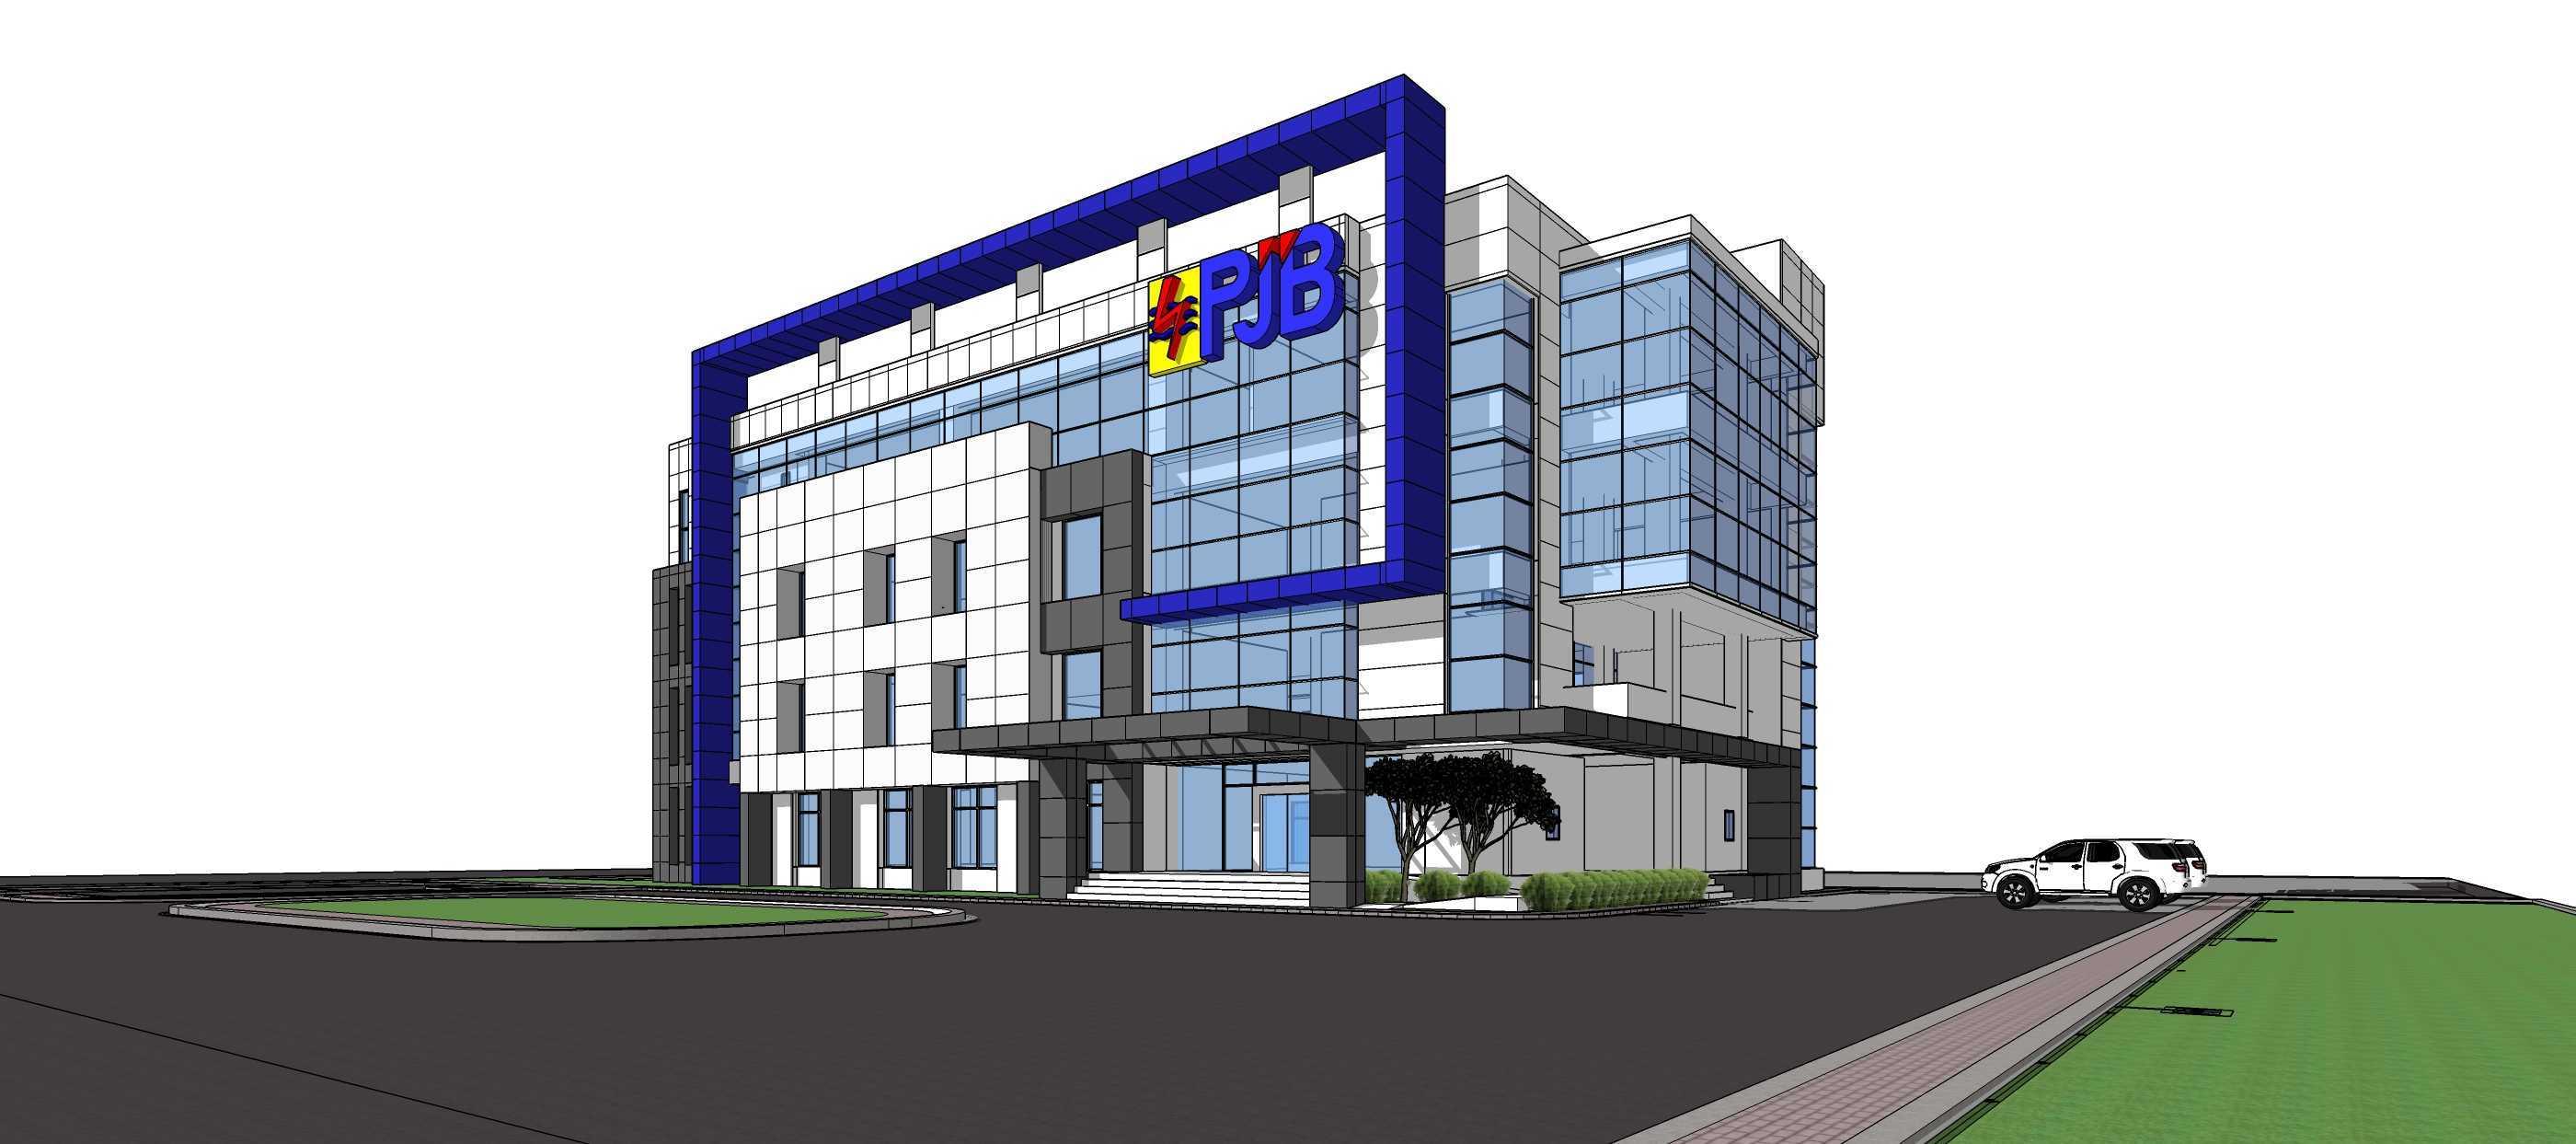 Gubah Ruang Studio Pjb Office Jakarta, Daerah Khusus Ibukota Jakarta, Indonesia Jakarta, Daerah Khusus Ibukota Jakarta, Indonesia Exterior View Modern  50857